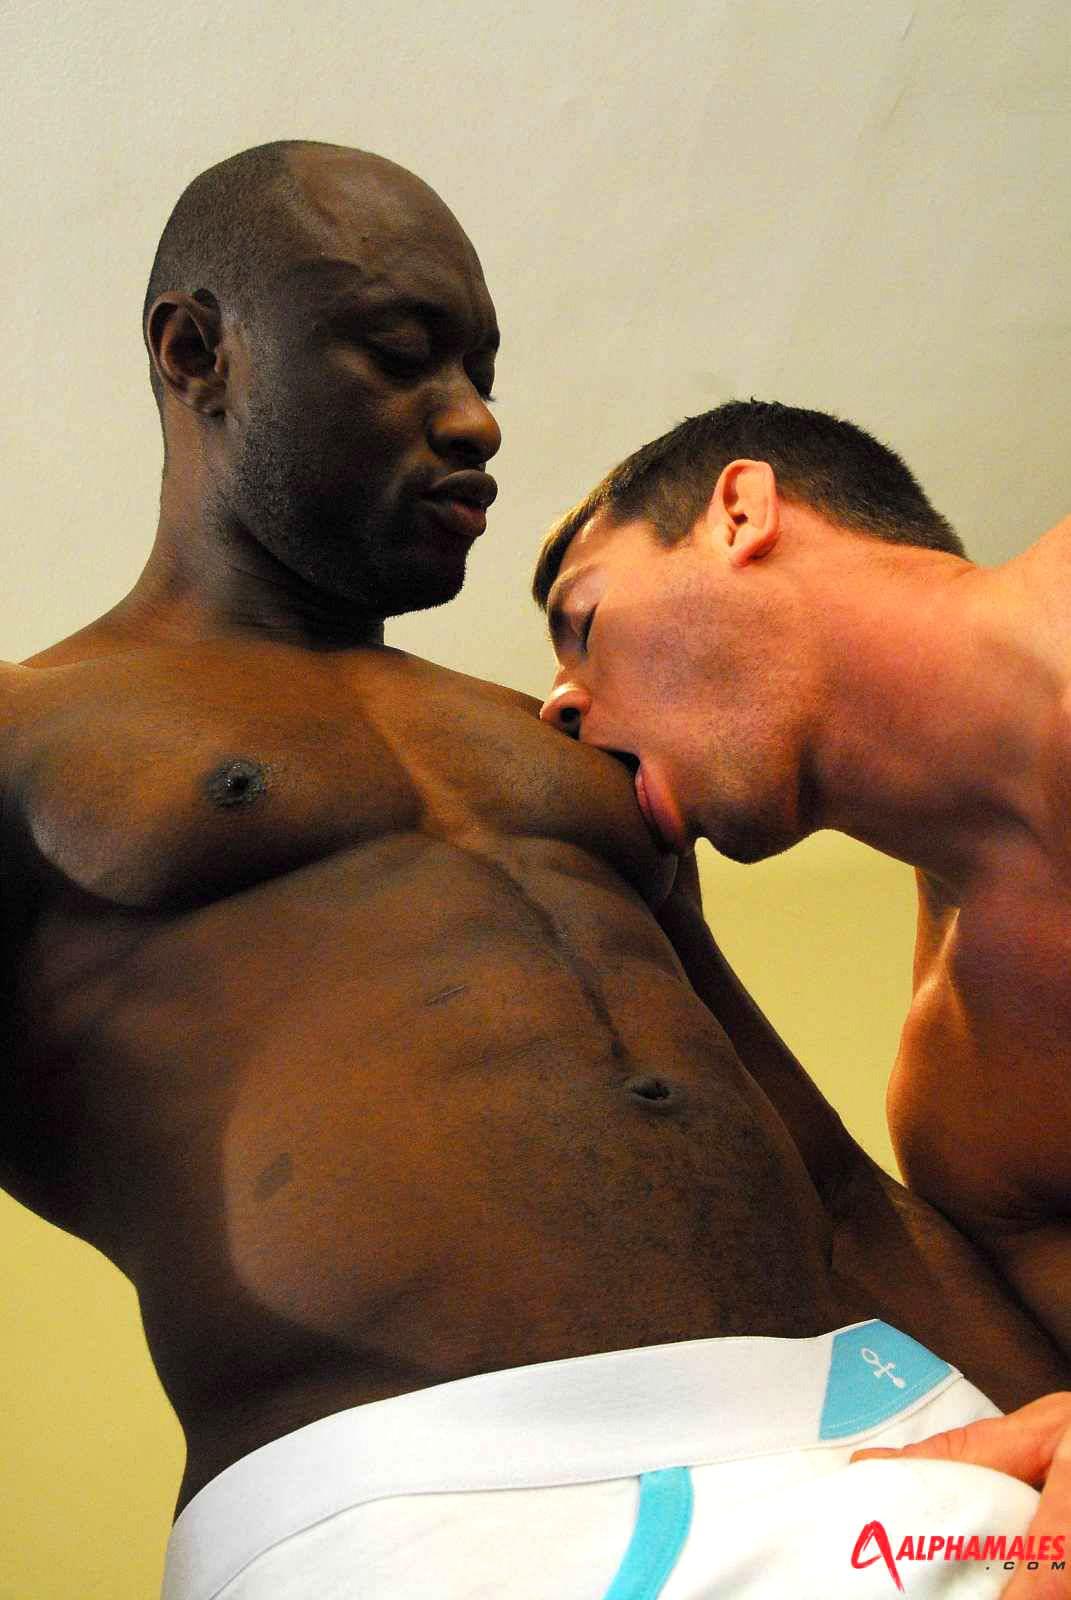 Interracial muscle fuckfest